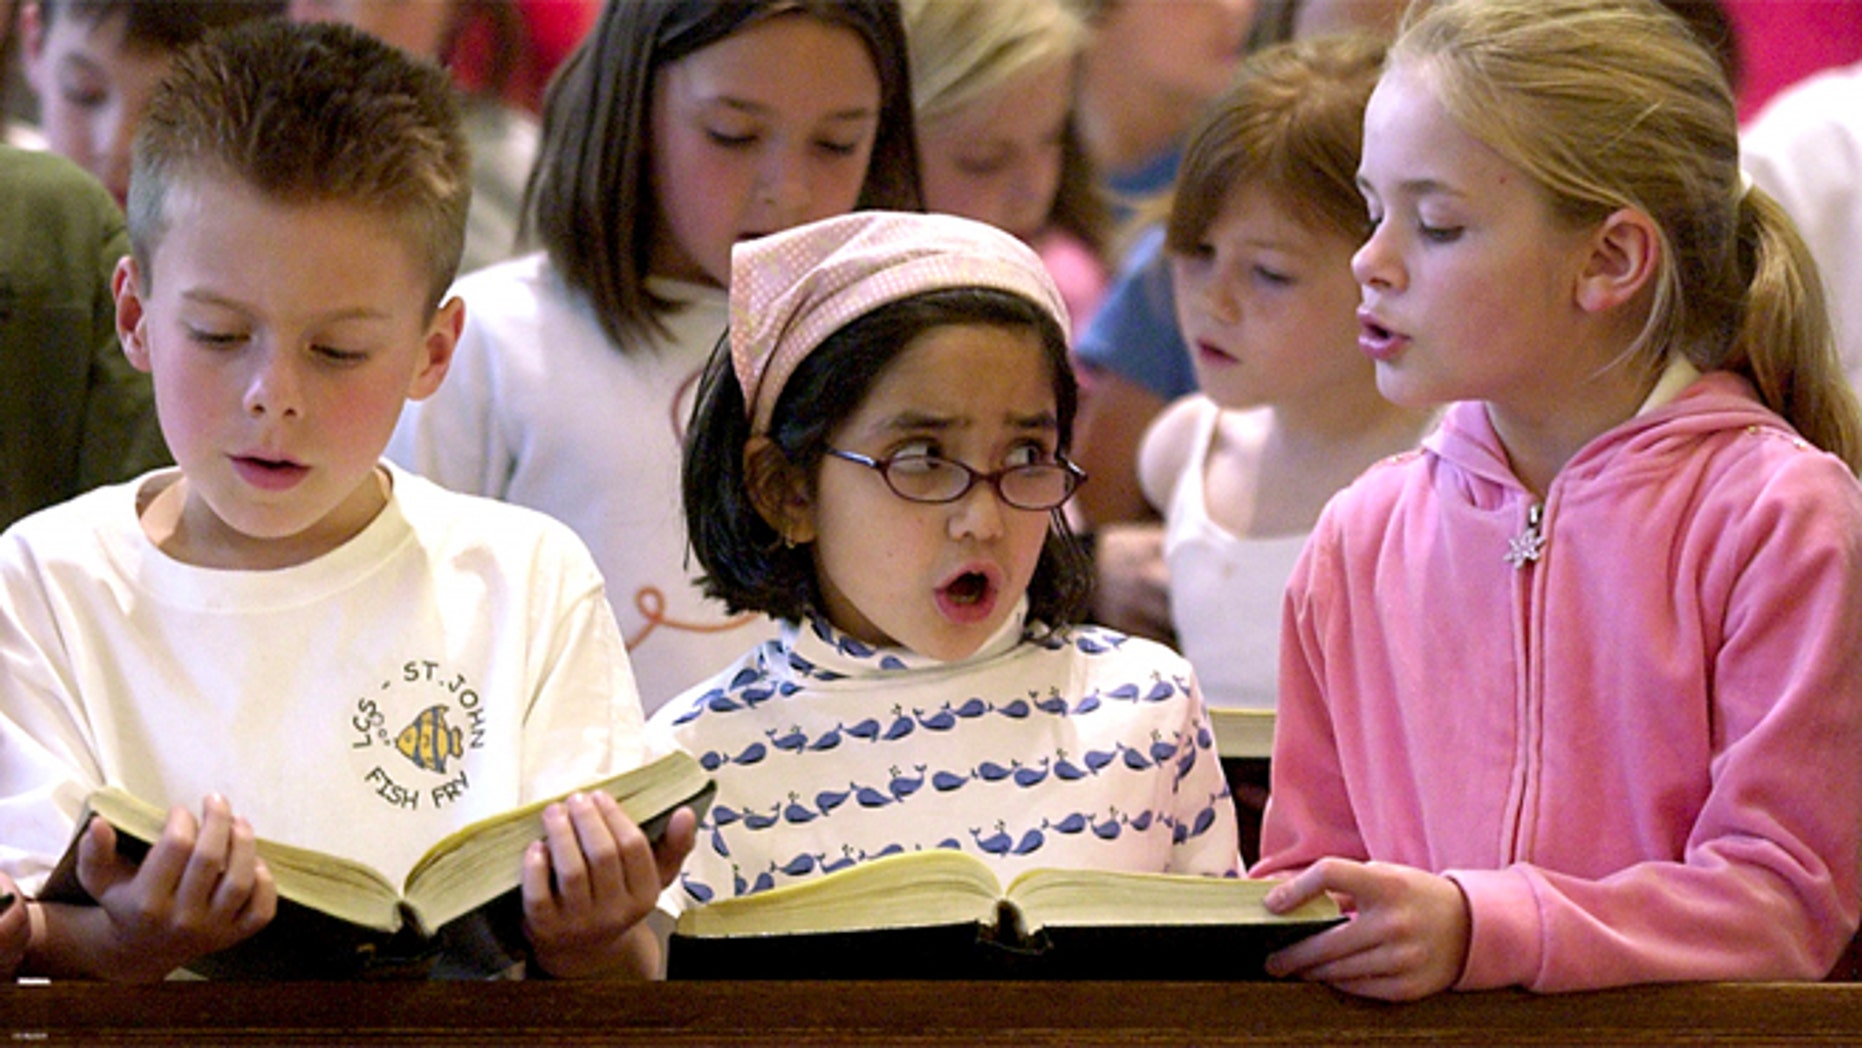 FILE: Catholic school students in Kansas sing at a prayer service.